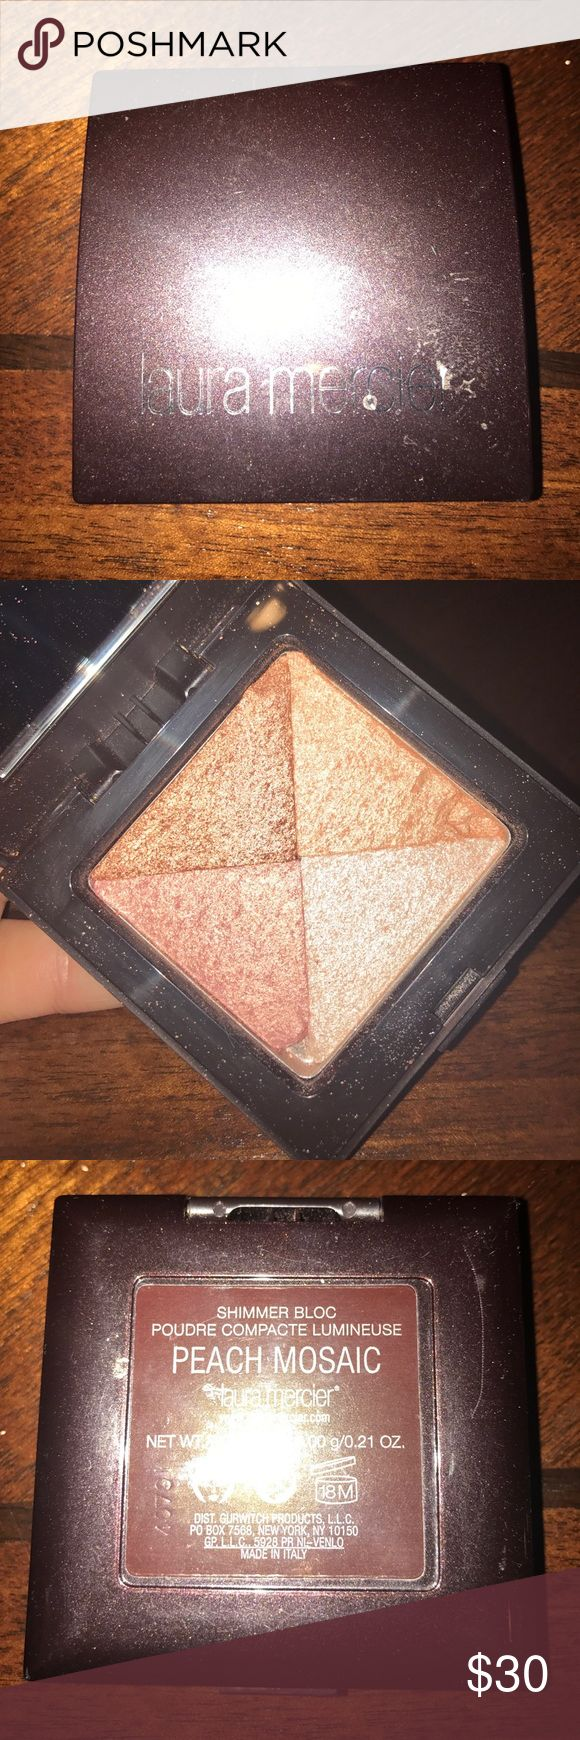 Laura Mercier Highlight Luminizer Peach Mosaic Laura Mercier Makeup Luminizer